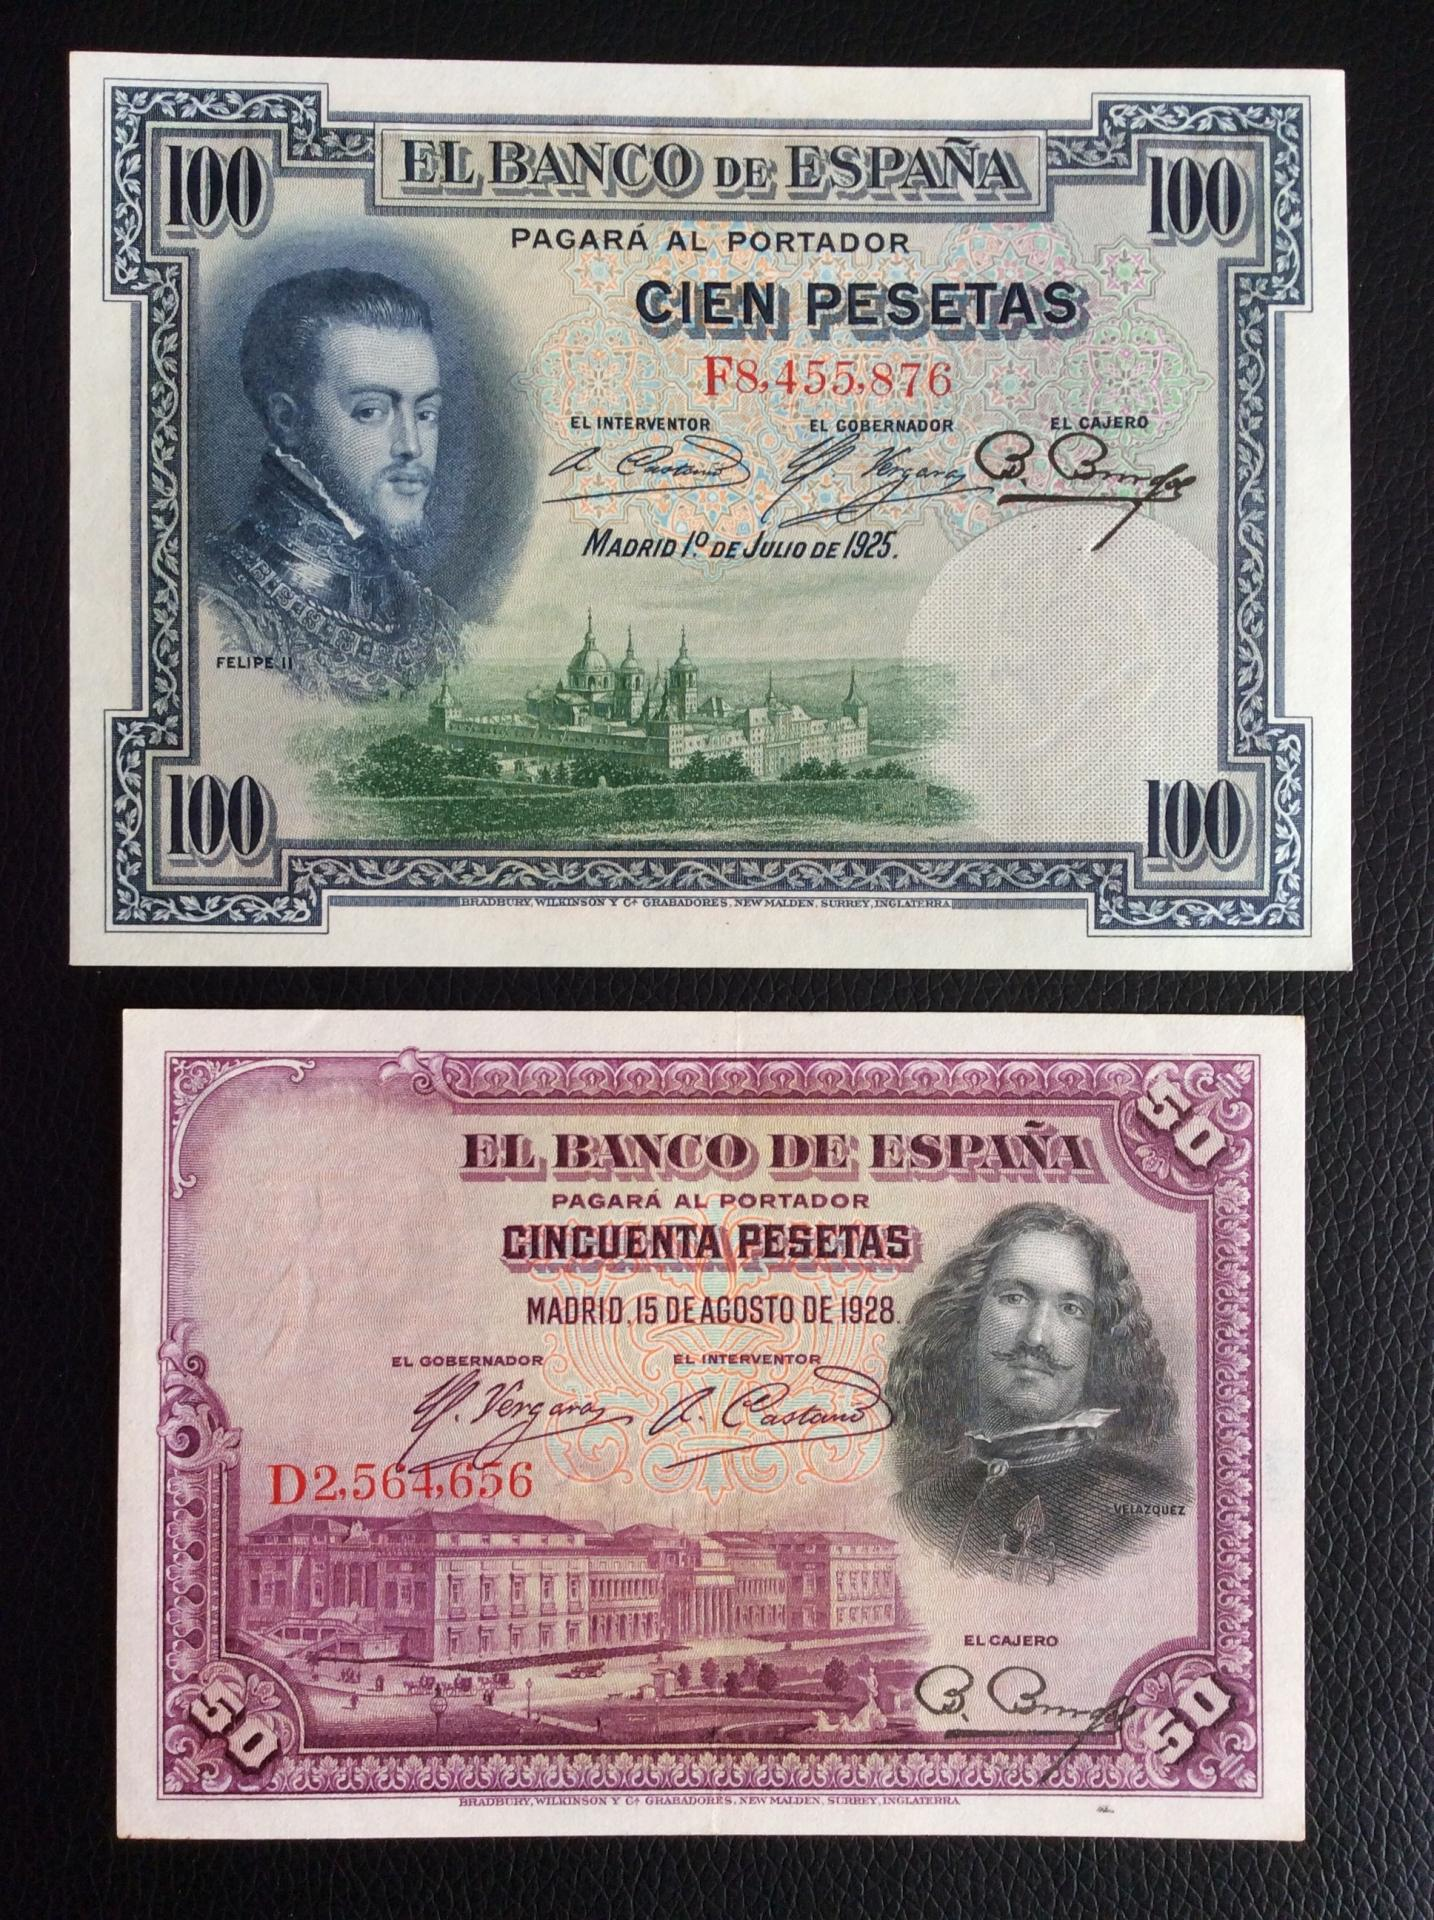 LOTE 100 PESETAS 1925 + 50 PESETAS 1928